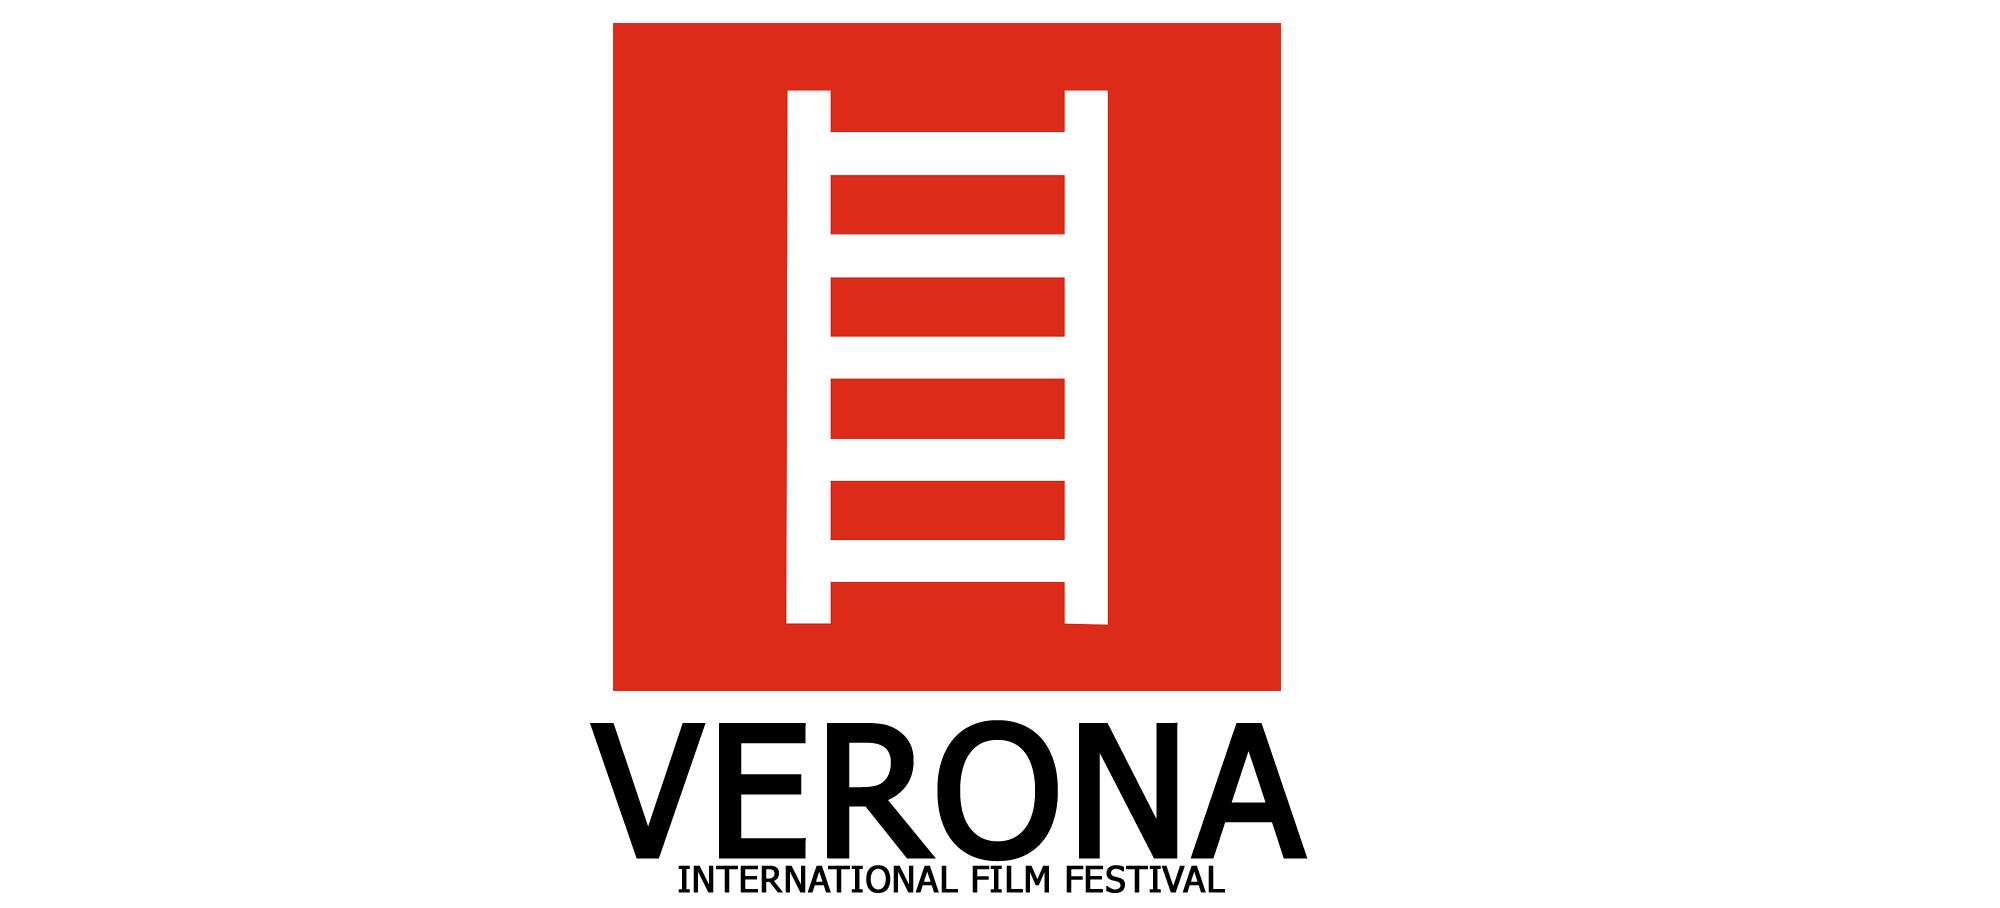 verona-film-festival-b